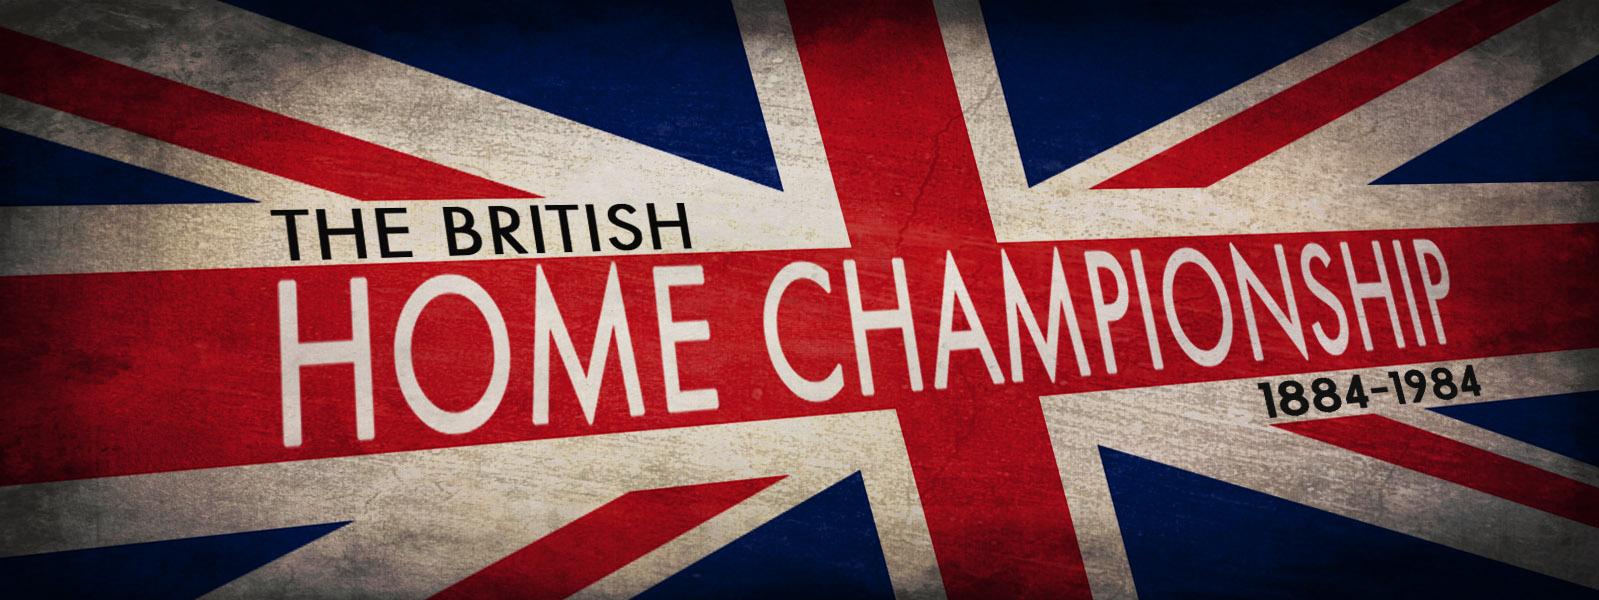 The British Home Championship